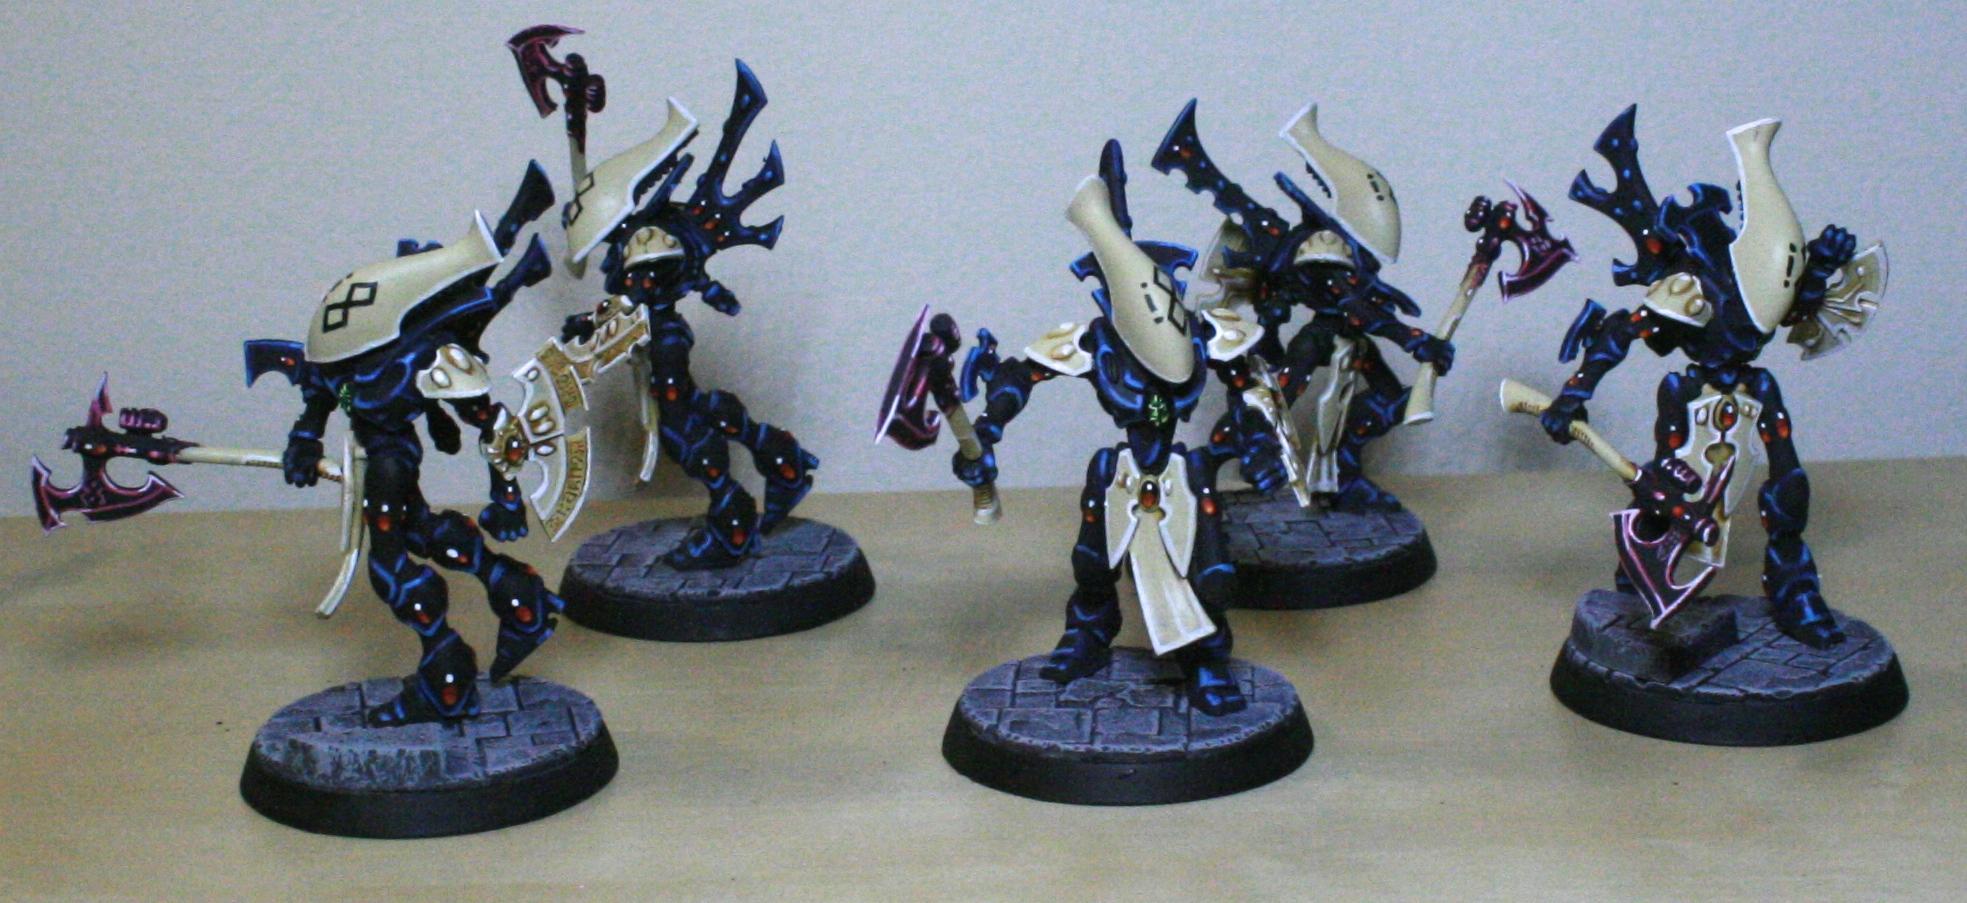 Eldar, Ulthwe, Warhammer 40,000, Warhammer Fantasy